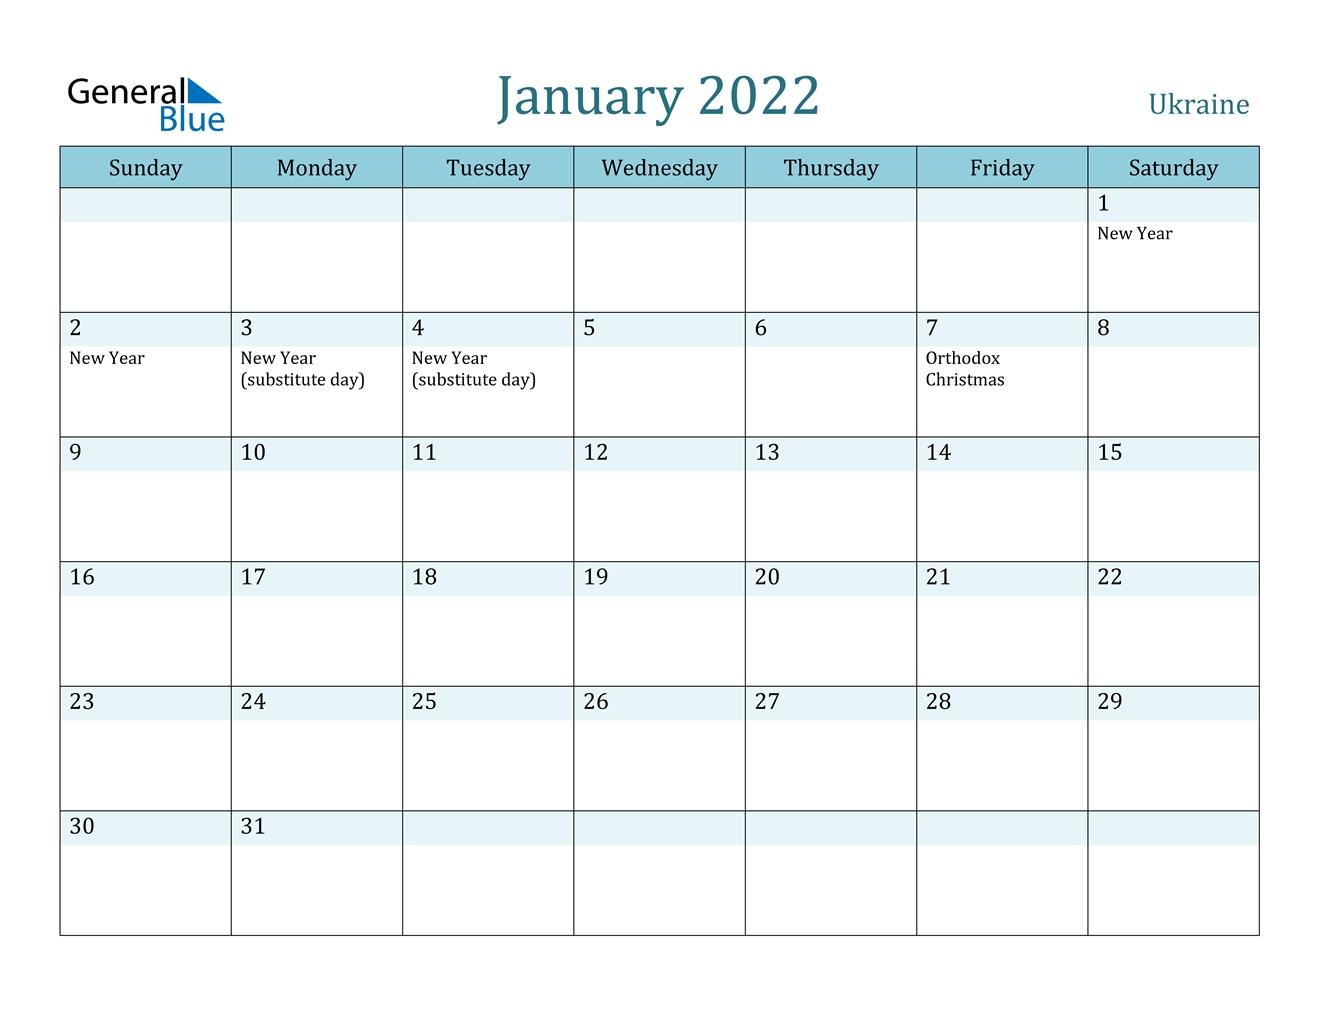 January 2022 Calendar - Ukraine